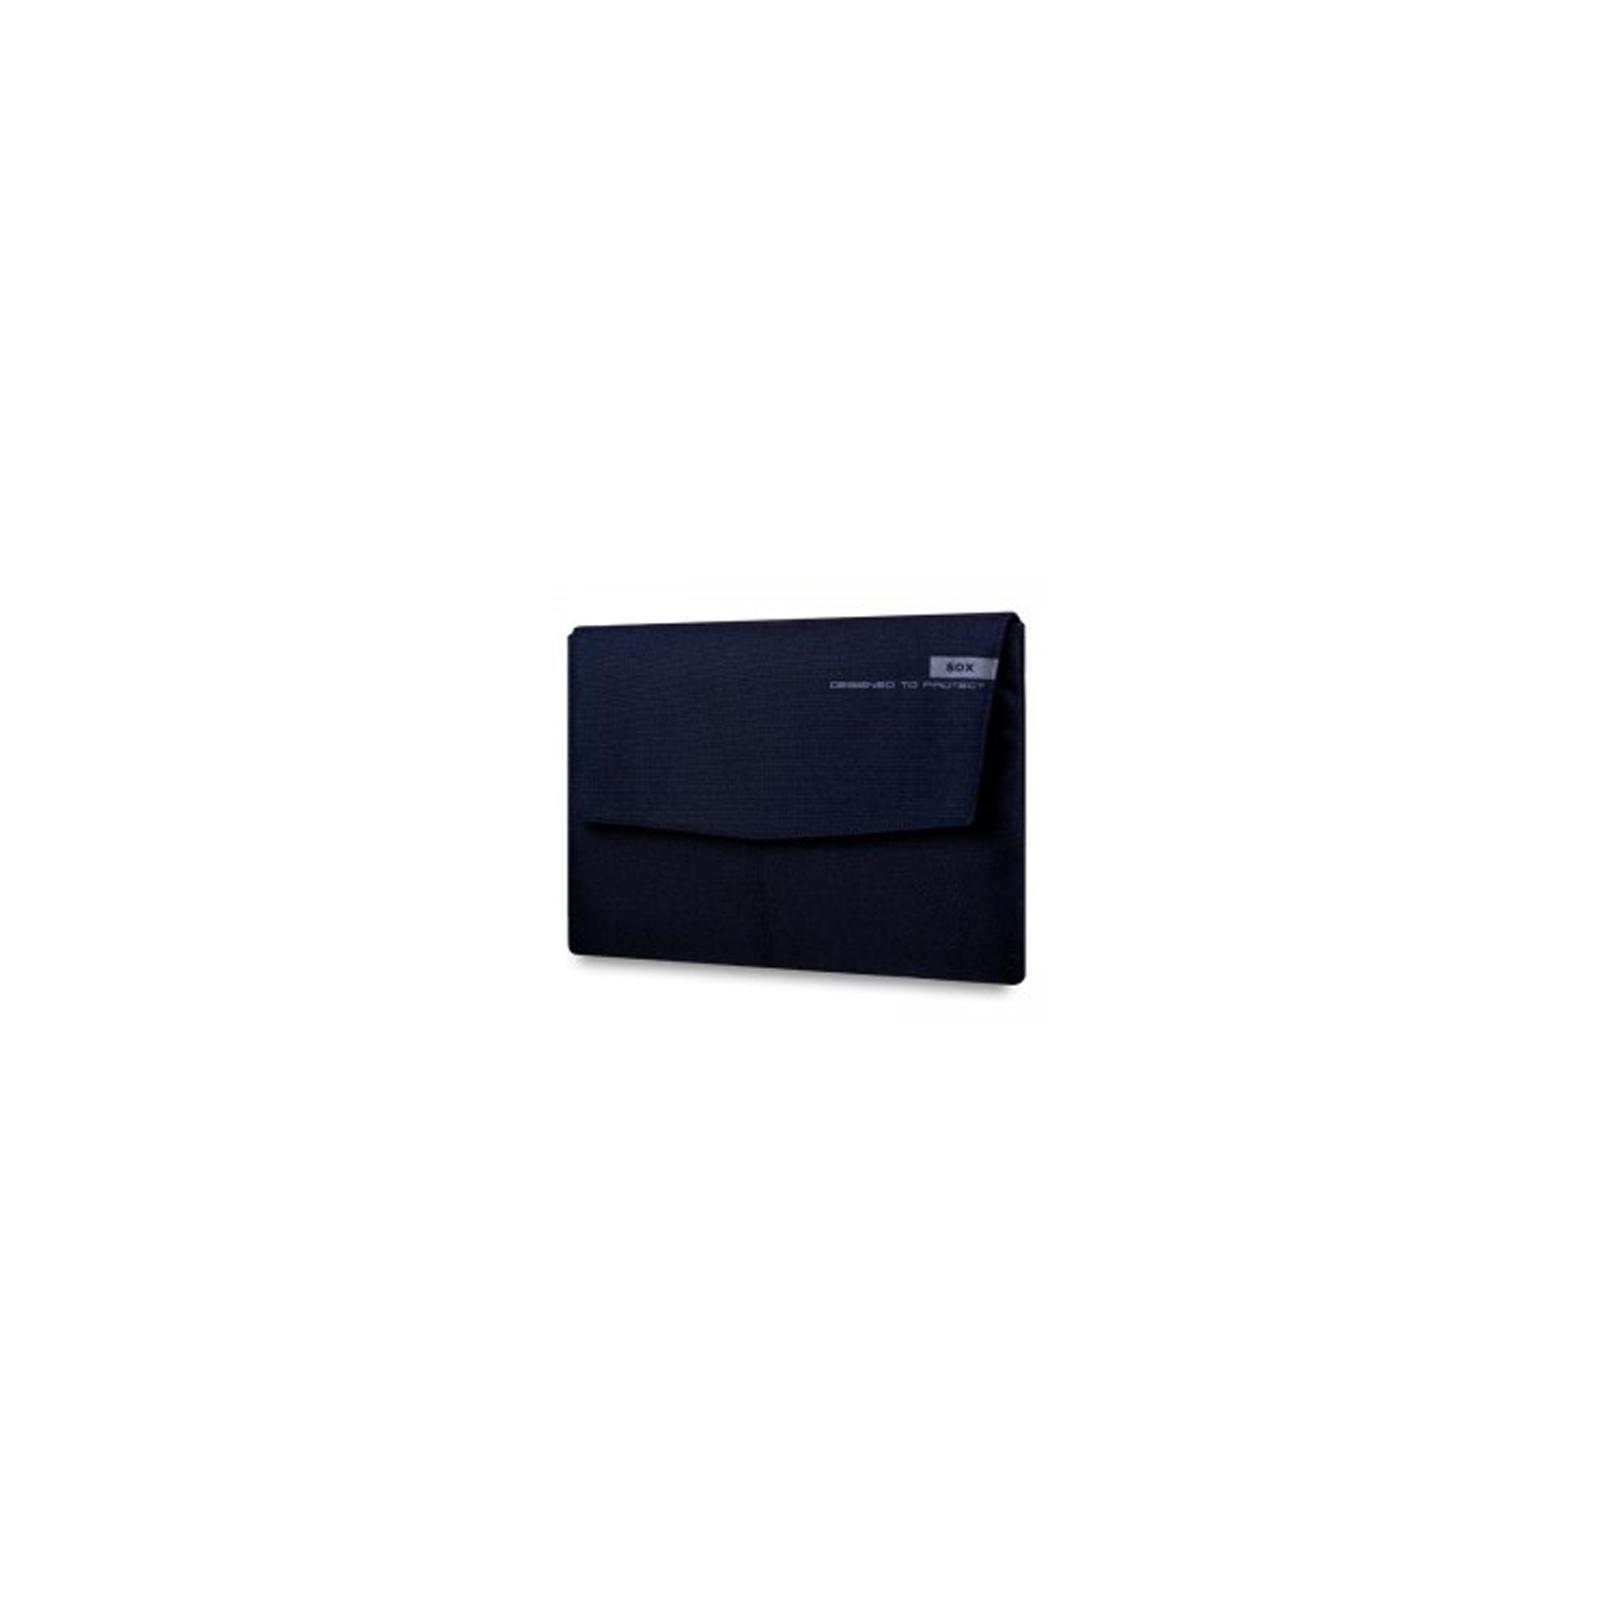 Чехол для планшета SLE NB1 GX7 Sox